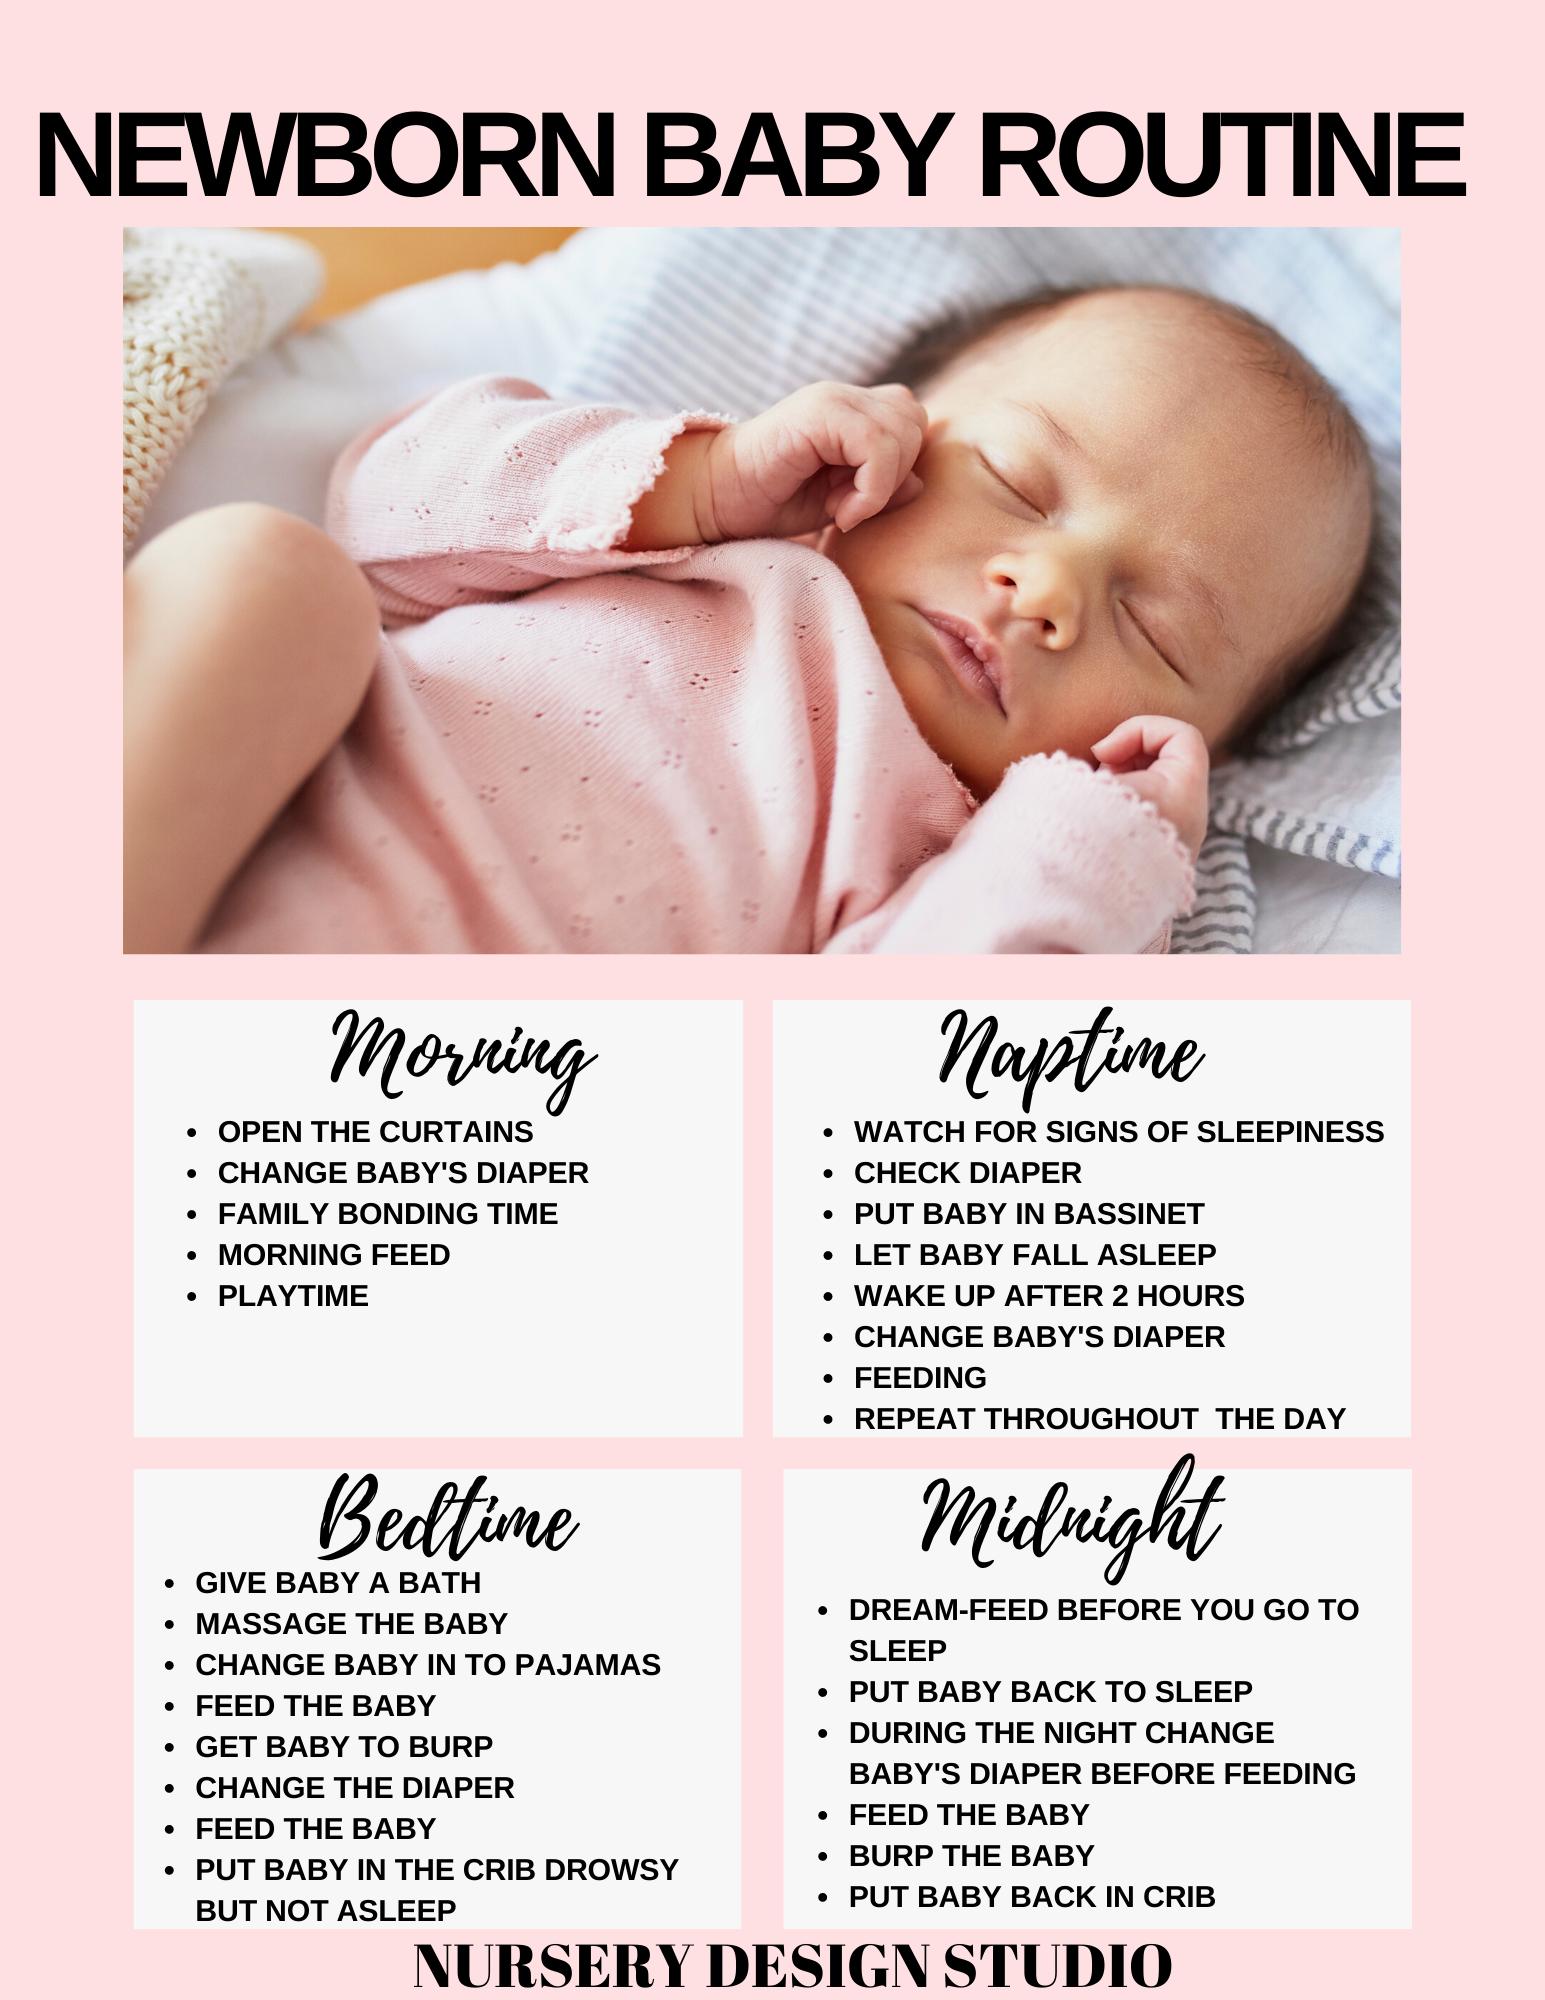 newborn baby routine